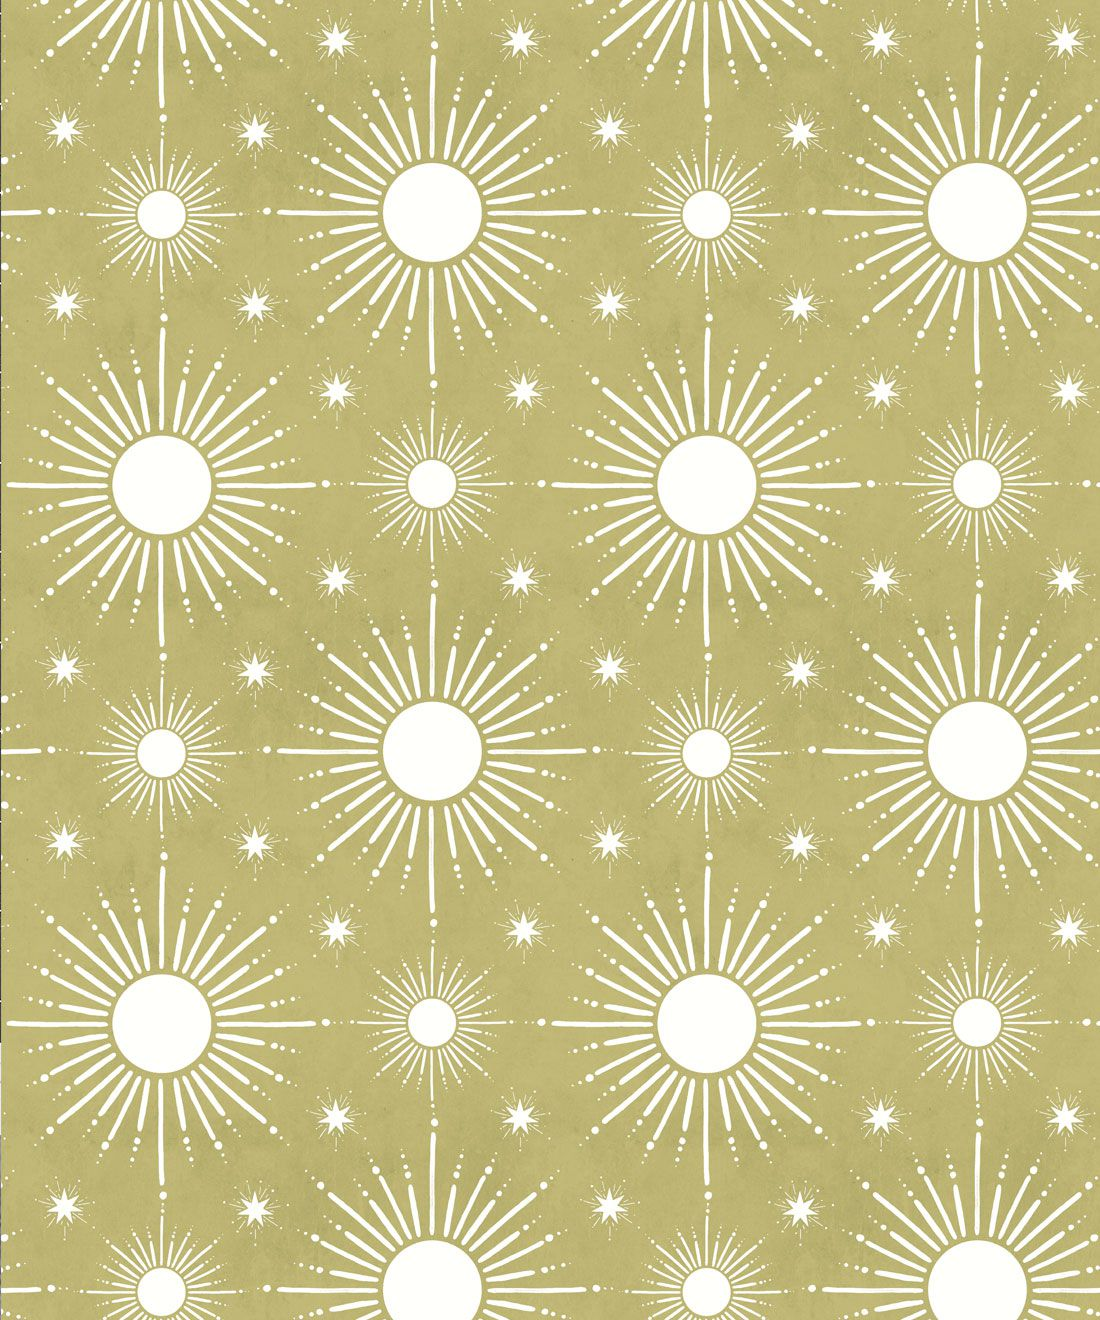 Sun Light Star Bright Wallpaper • Chartreuse • Swatch